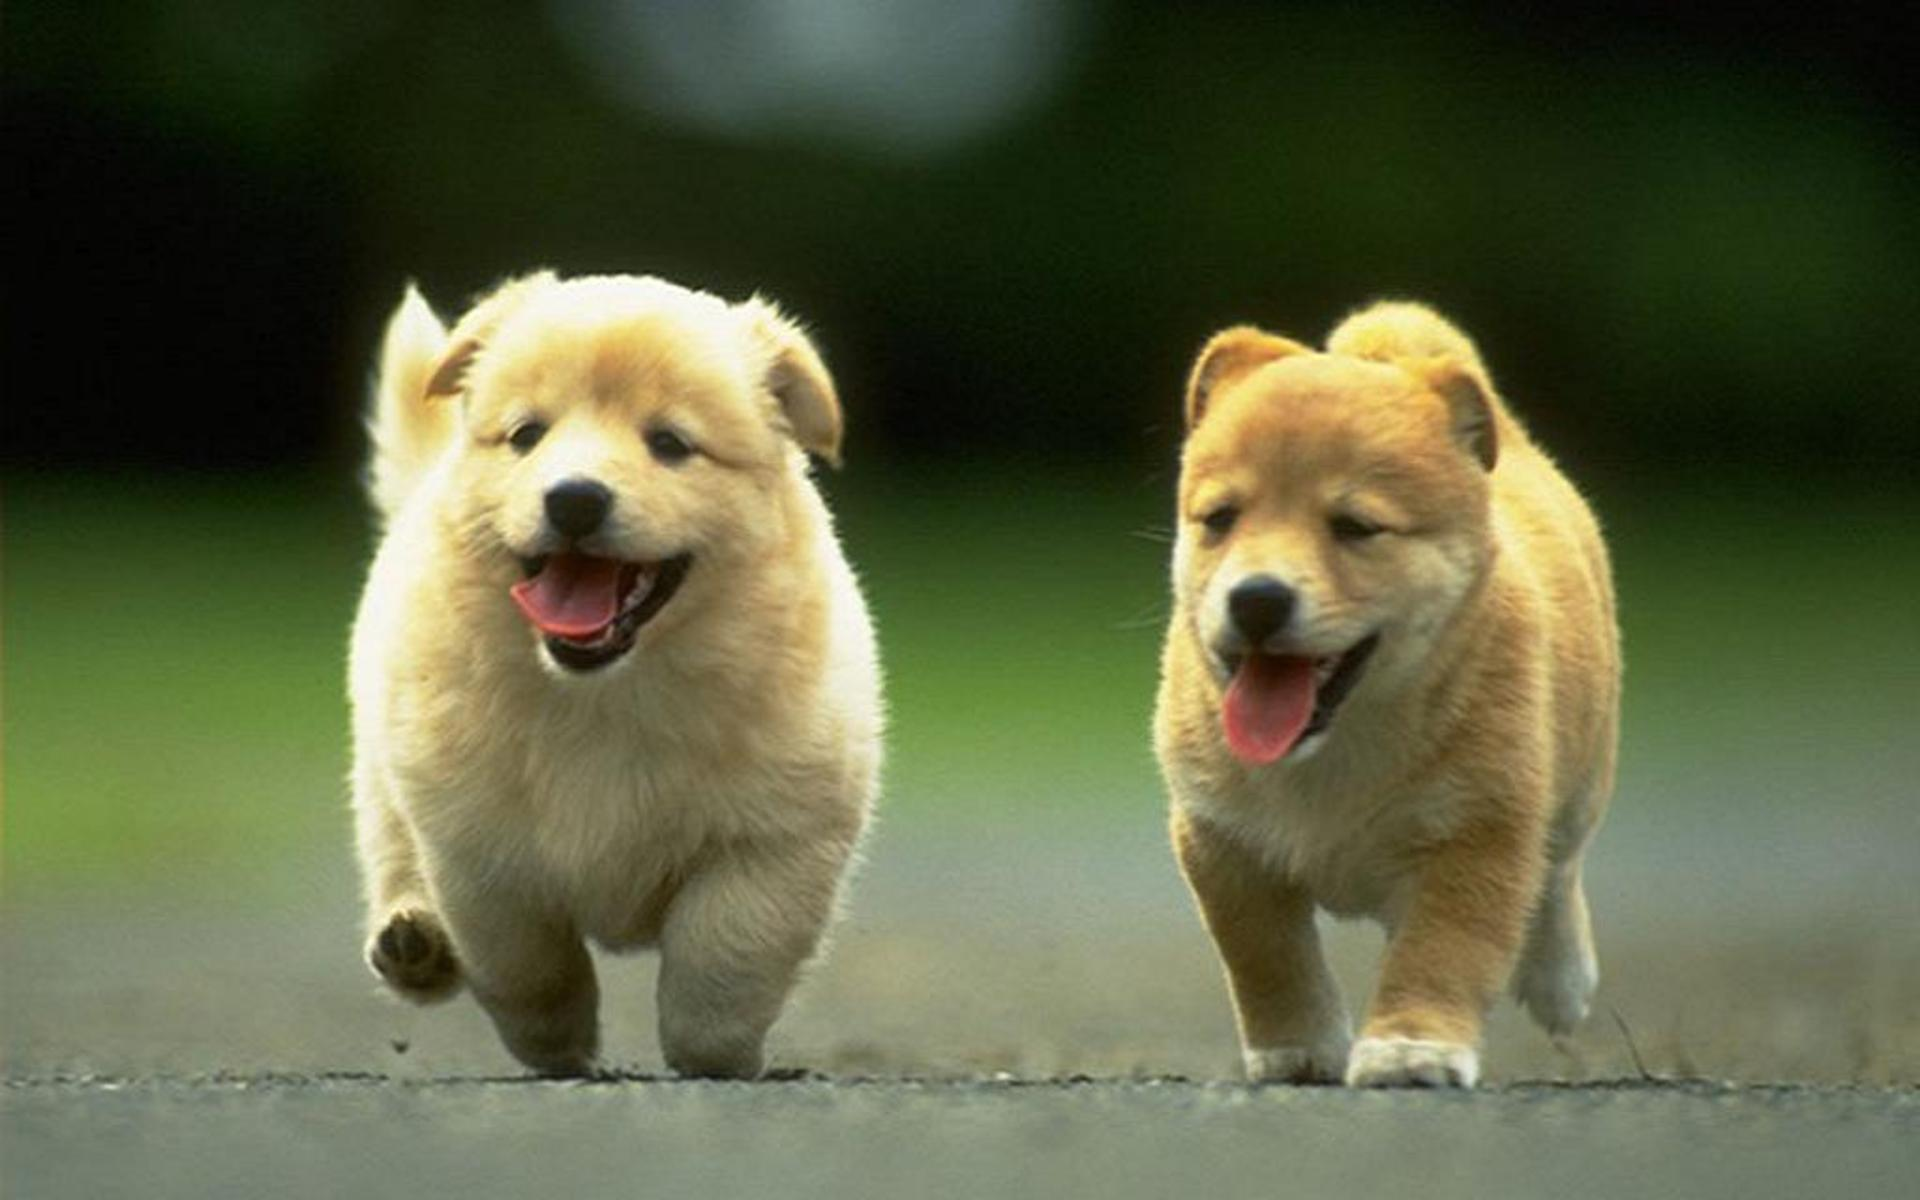 cute-couple-puppies-dogs-cub-88335 | michael bradley - time traveler